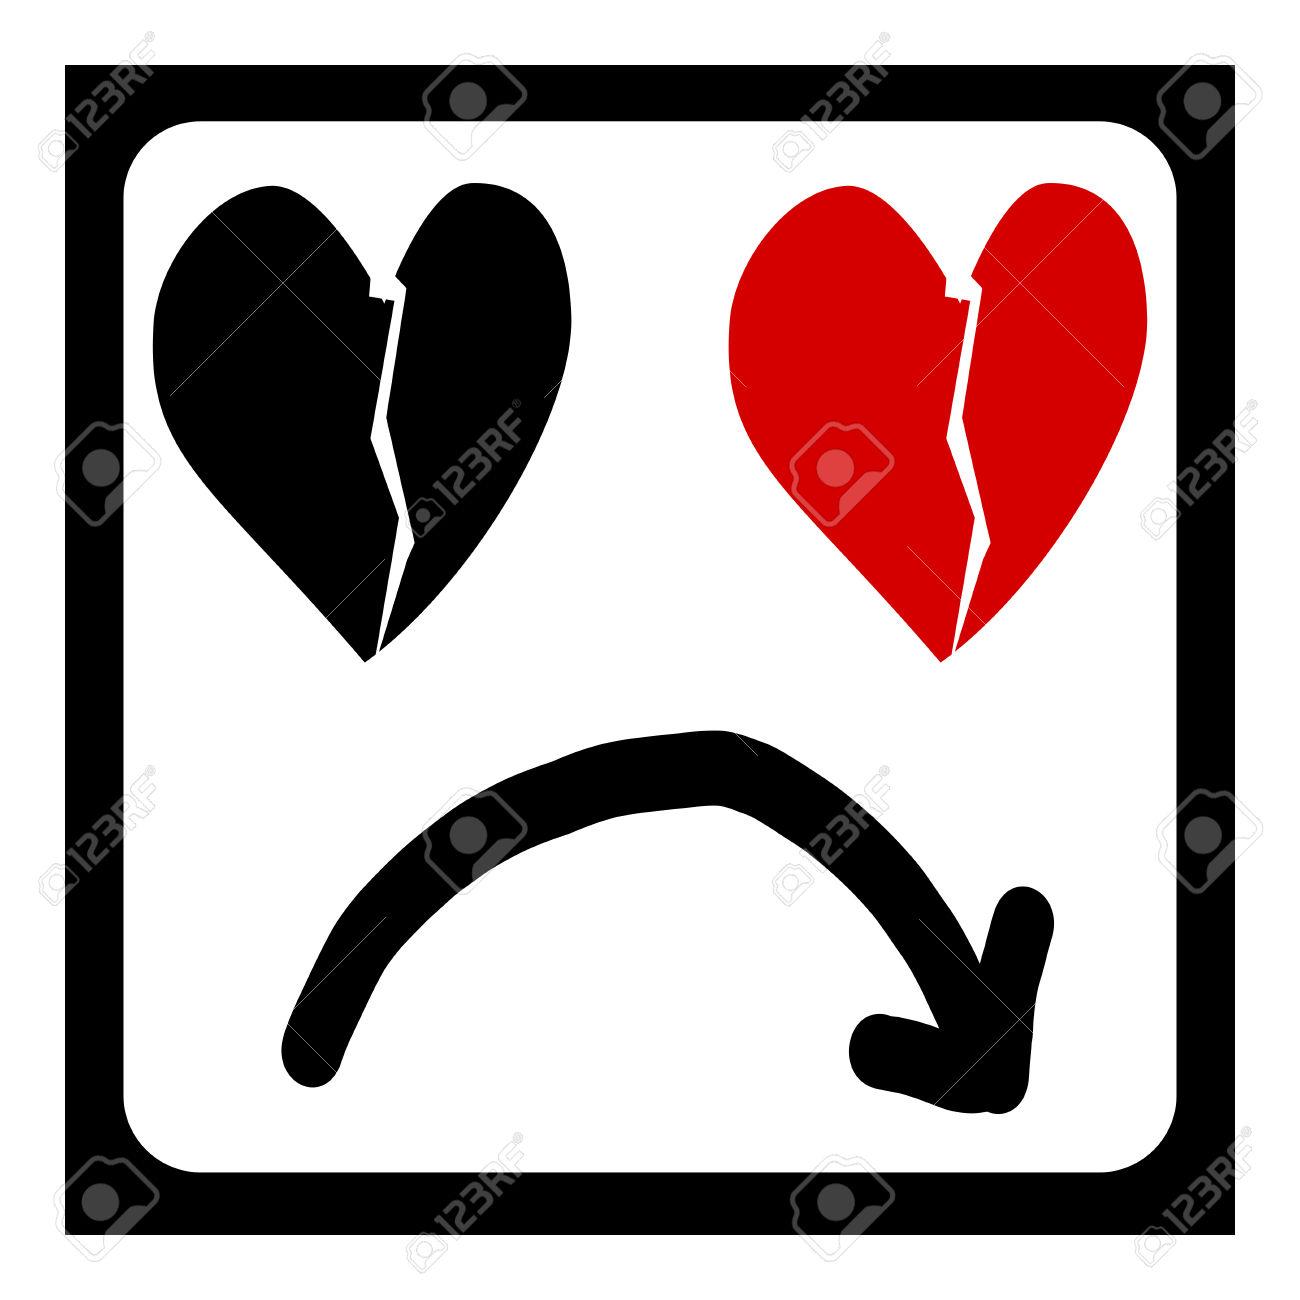 Love symbol with arrow clipart clip art royalty free Heartbreak And Arrow, Sad Love Symbol Vector Royalty Free Cliparts ... clip art royalty free